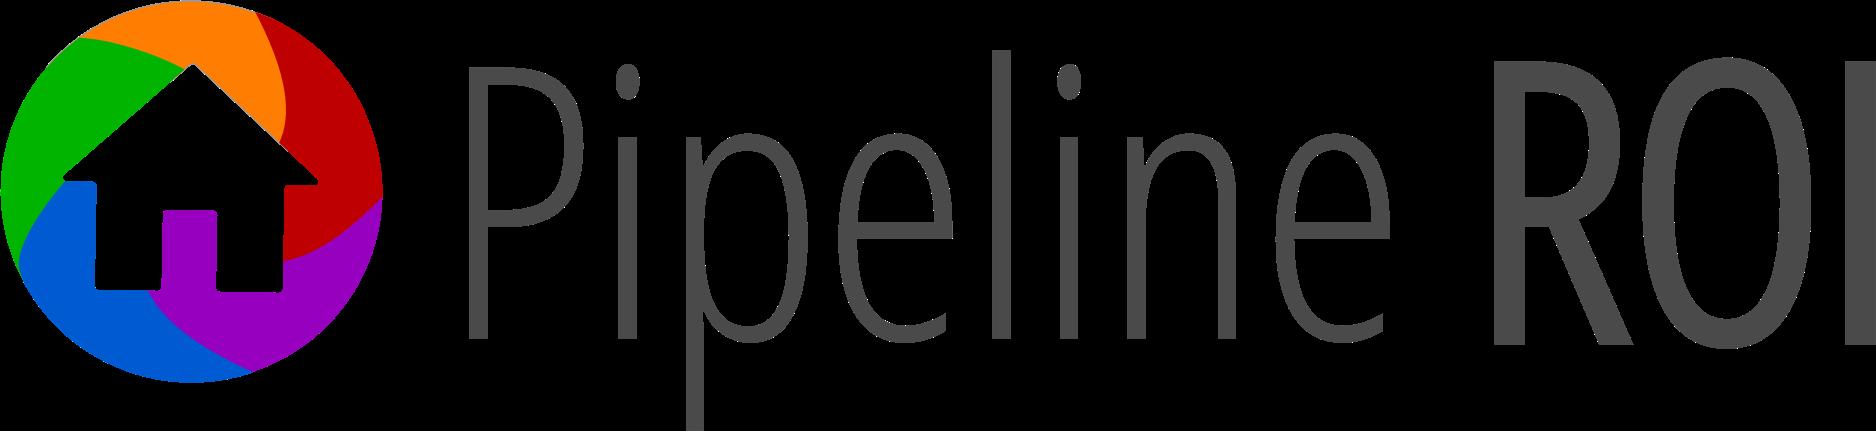 Pipeline ROI Logo